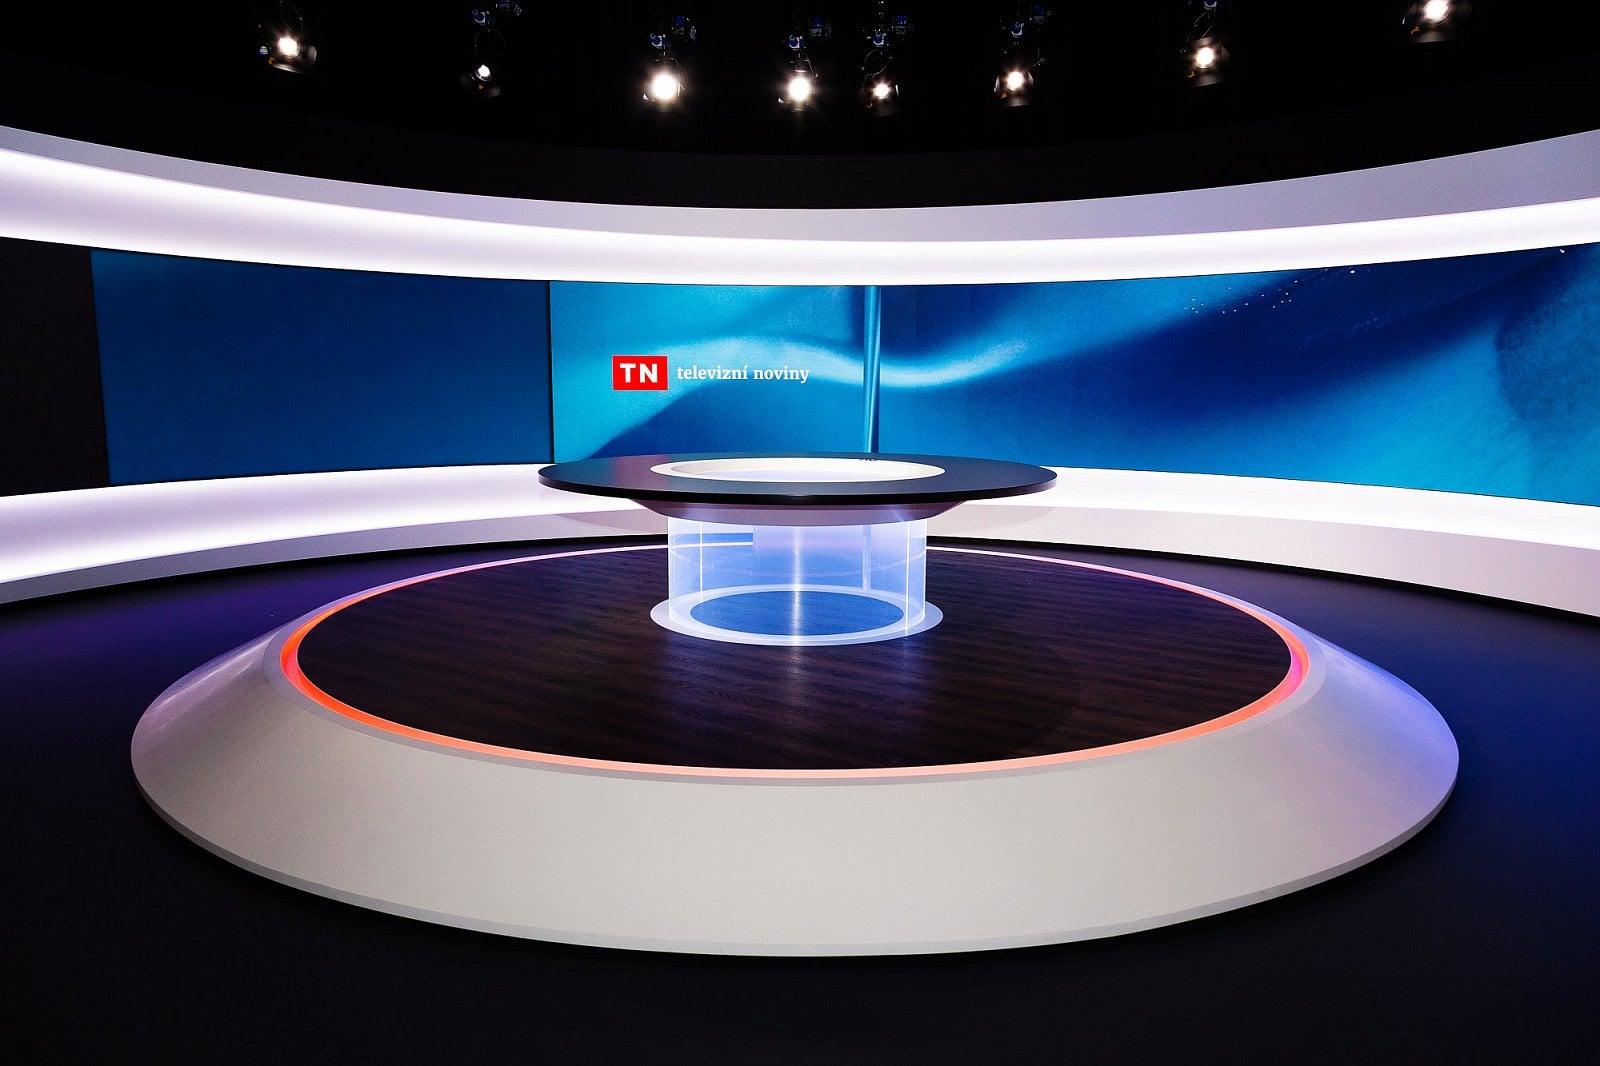 Zpravodajské studio TV Nova